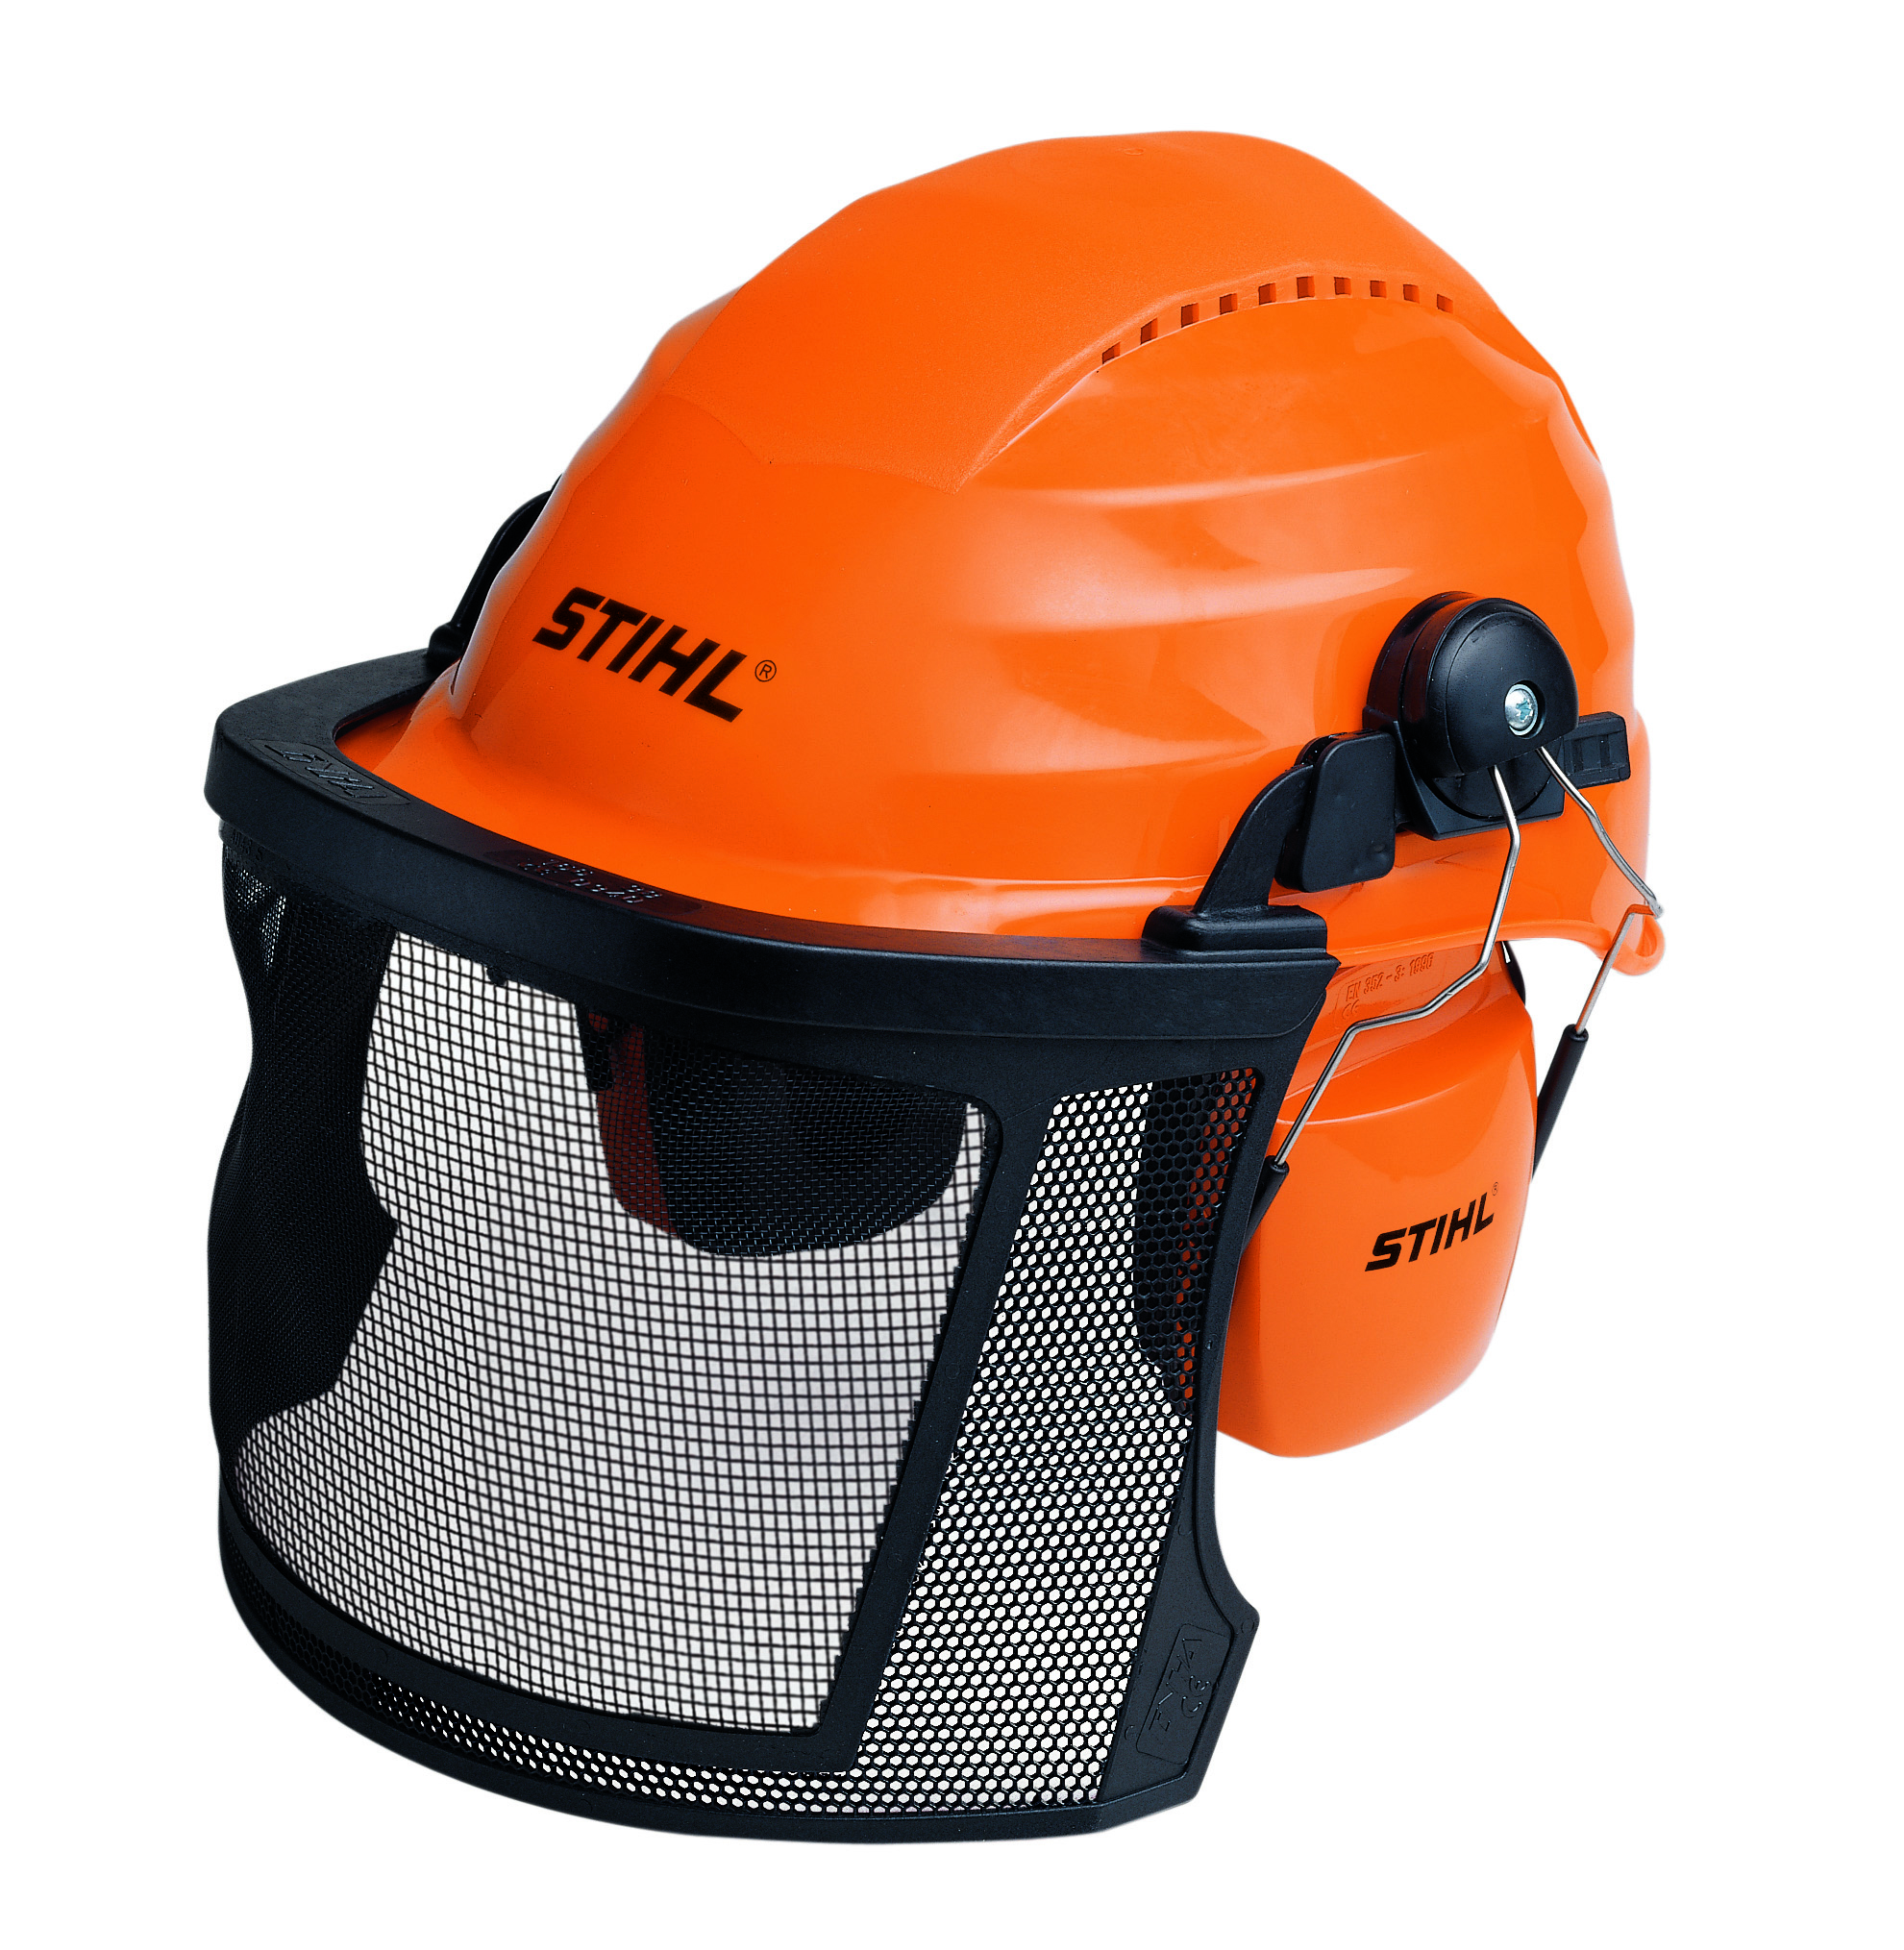 Stihl aero light safety helmet